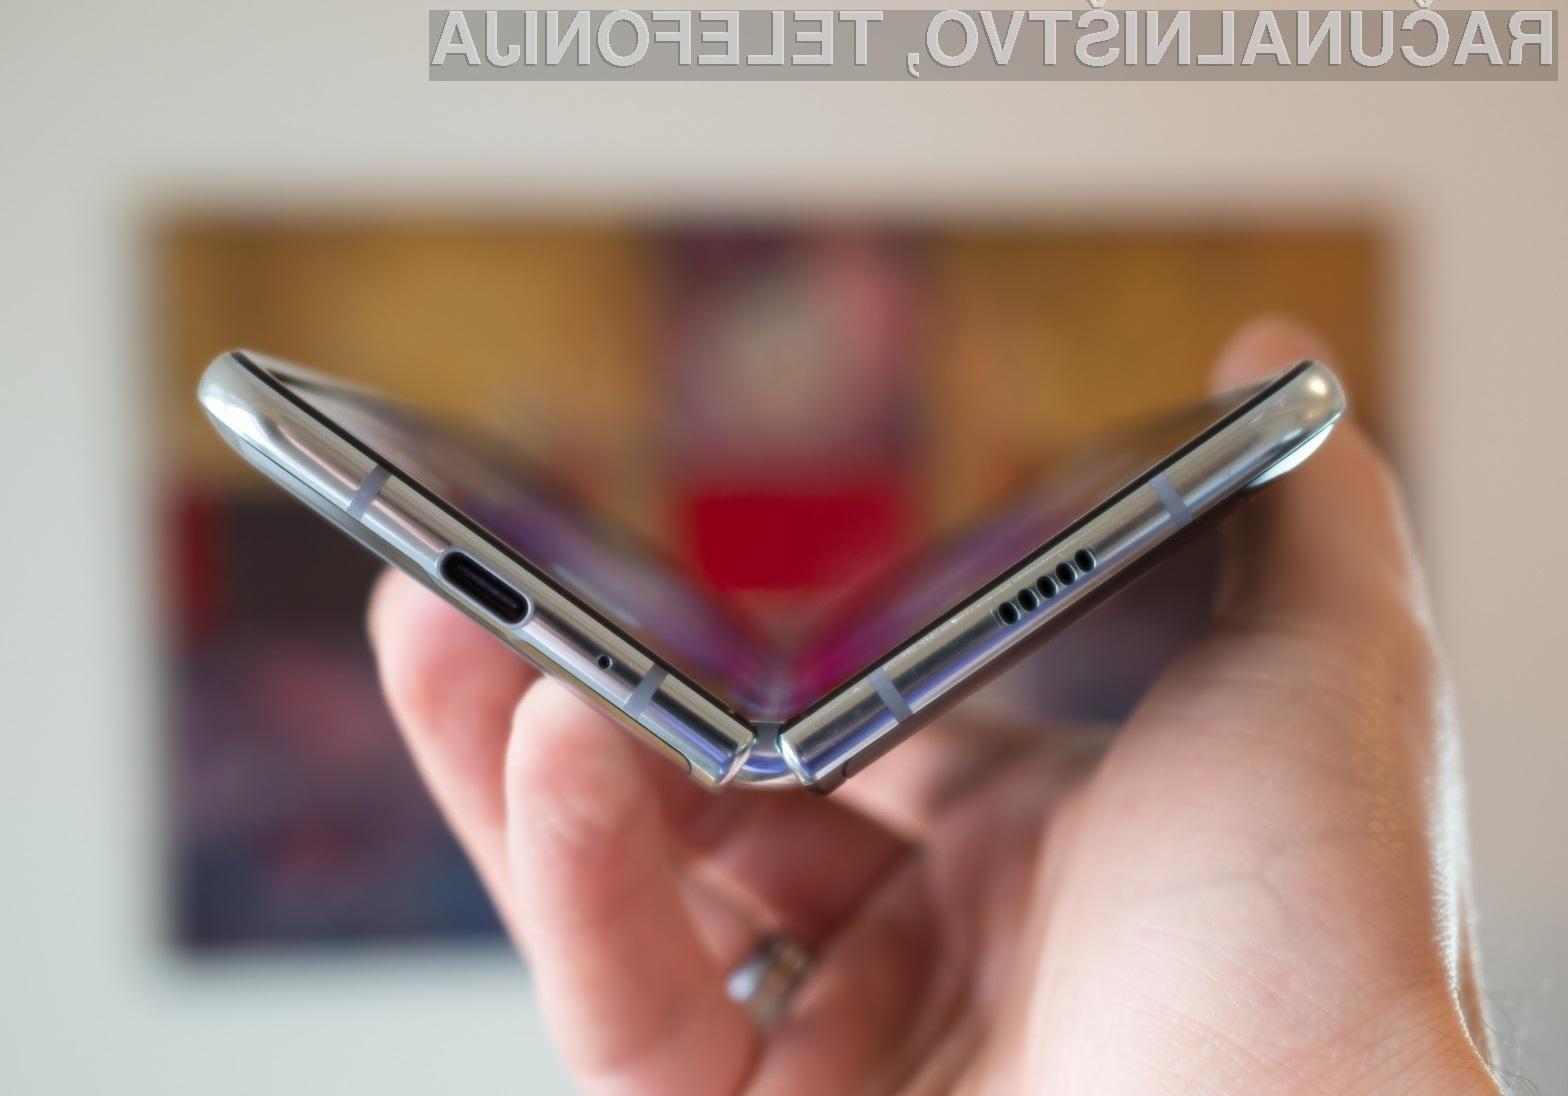 Pametni mobilni telefon Samsung Galaxy Fold je izdelan na osnovi inovativnih materialov.